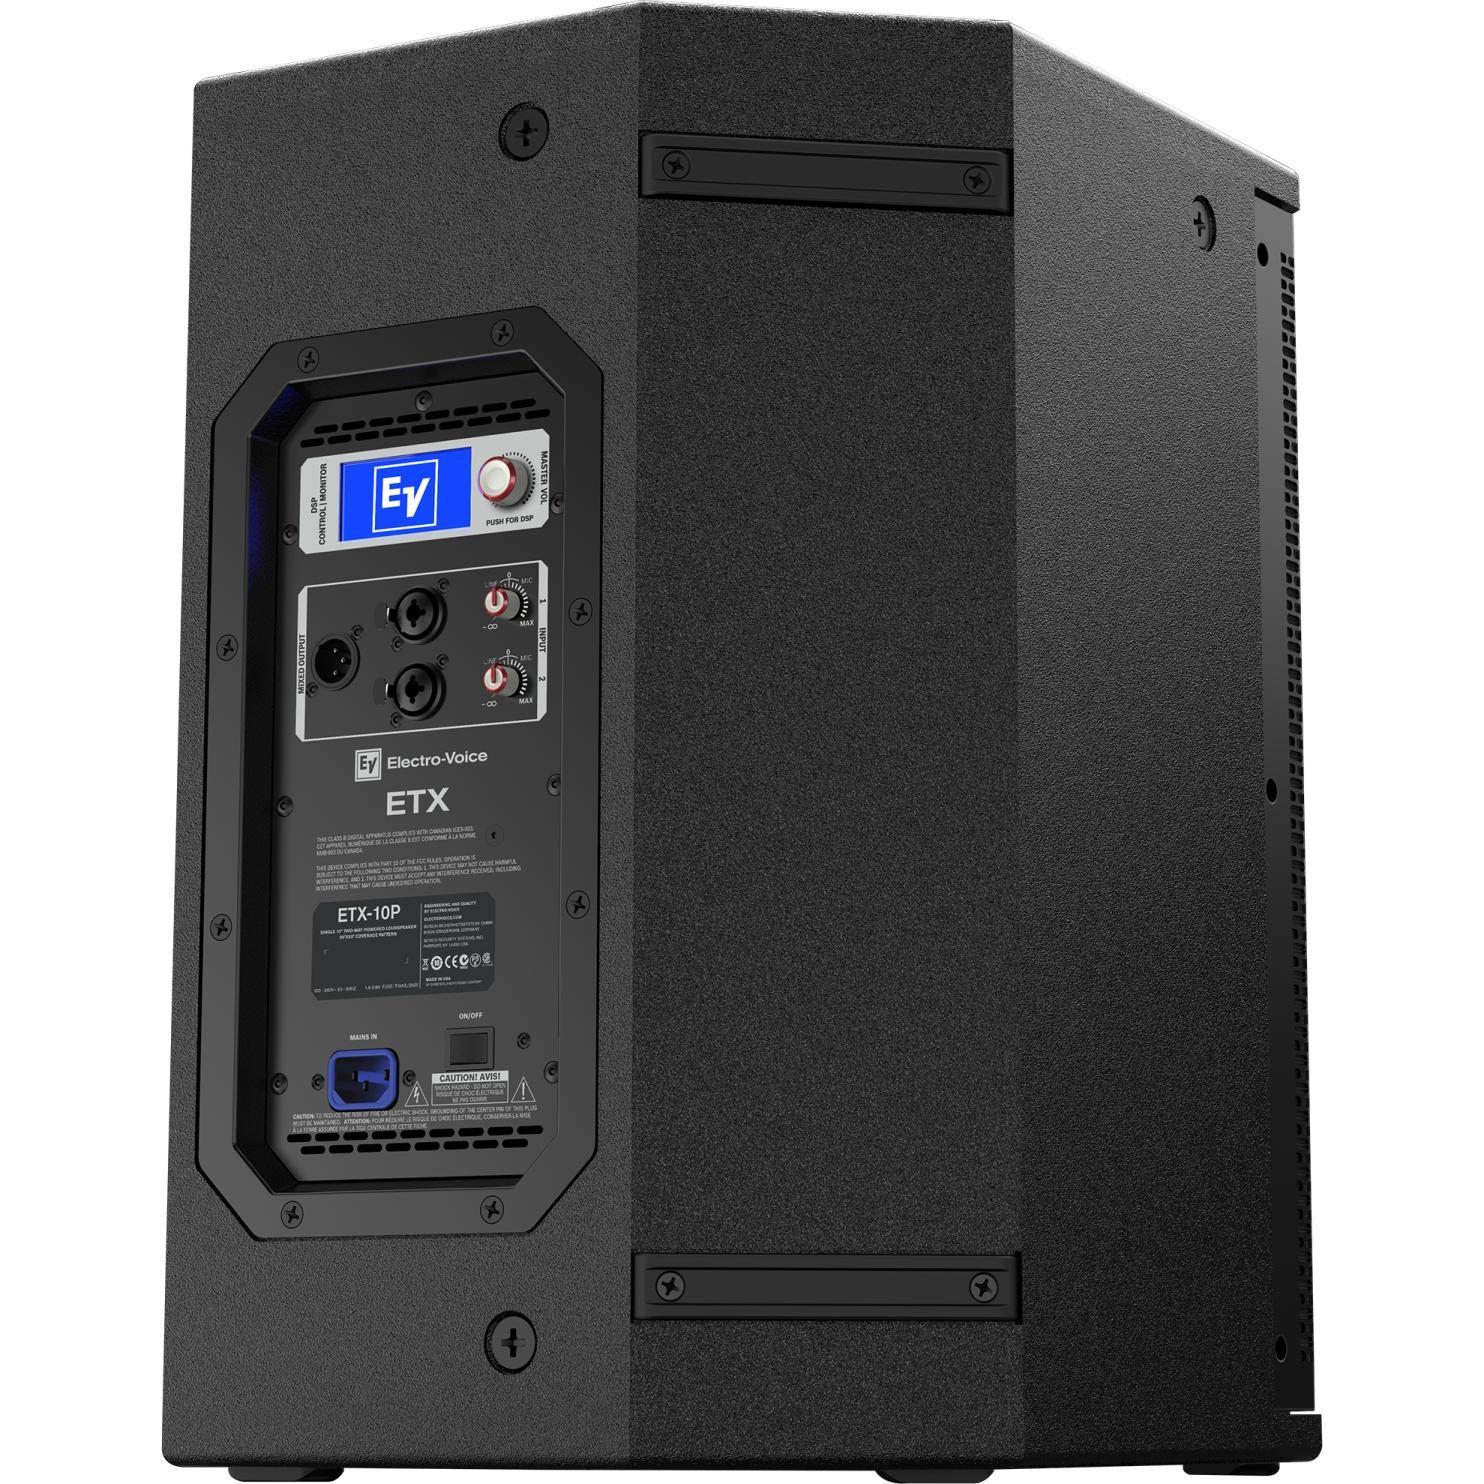 etx zad Electro Voice ETX 10P